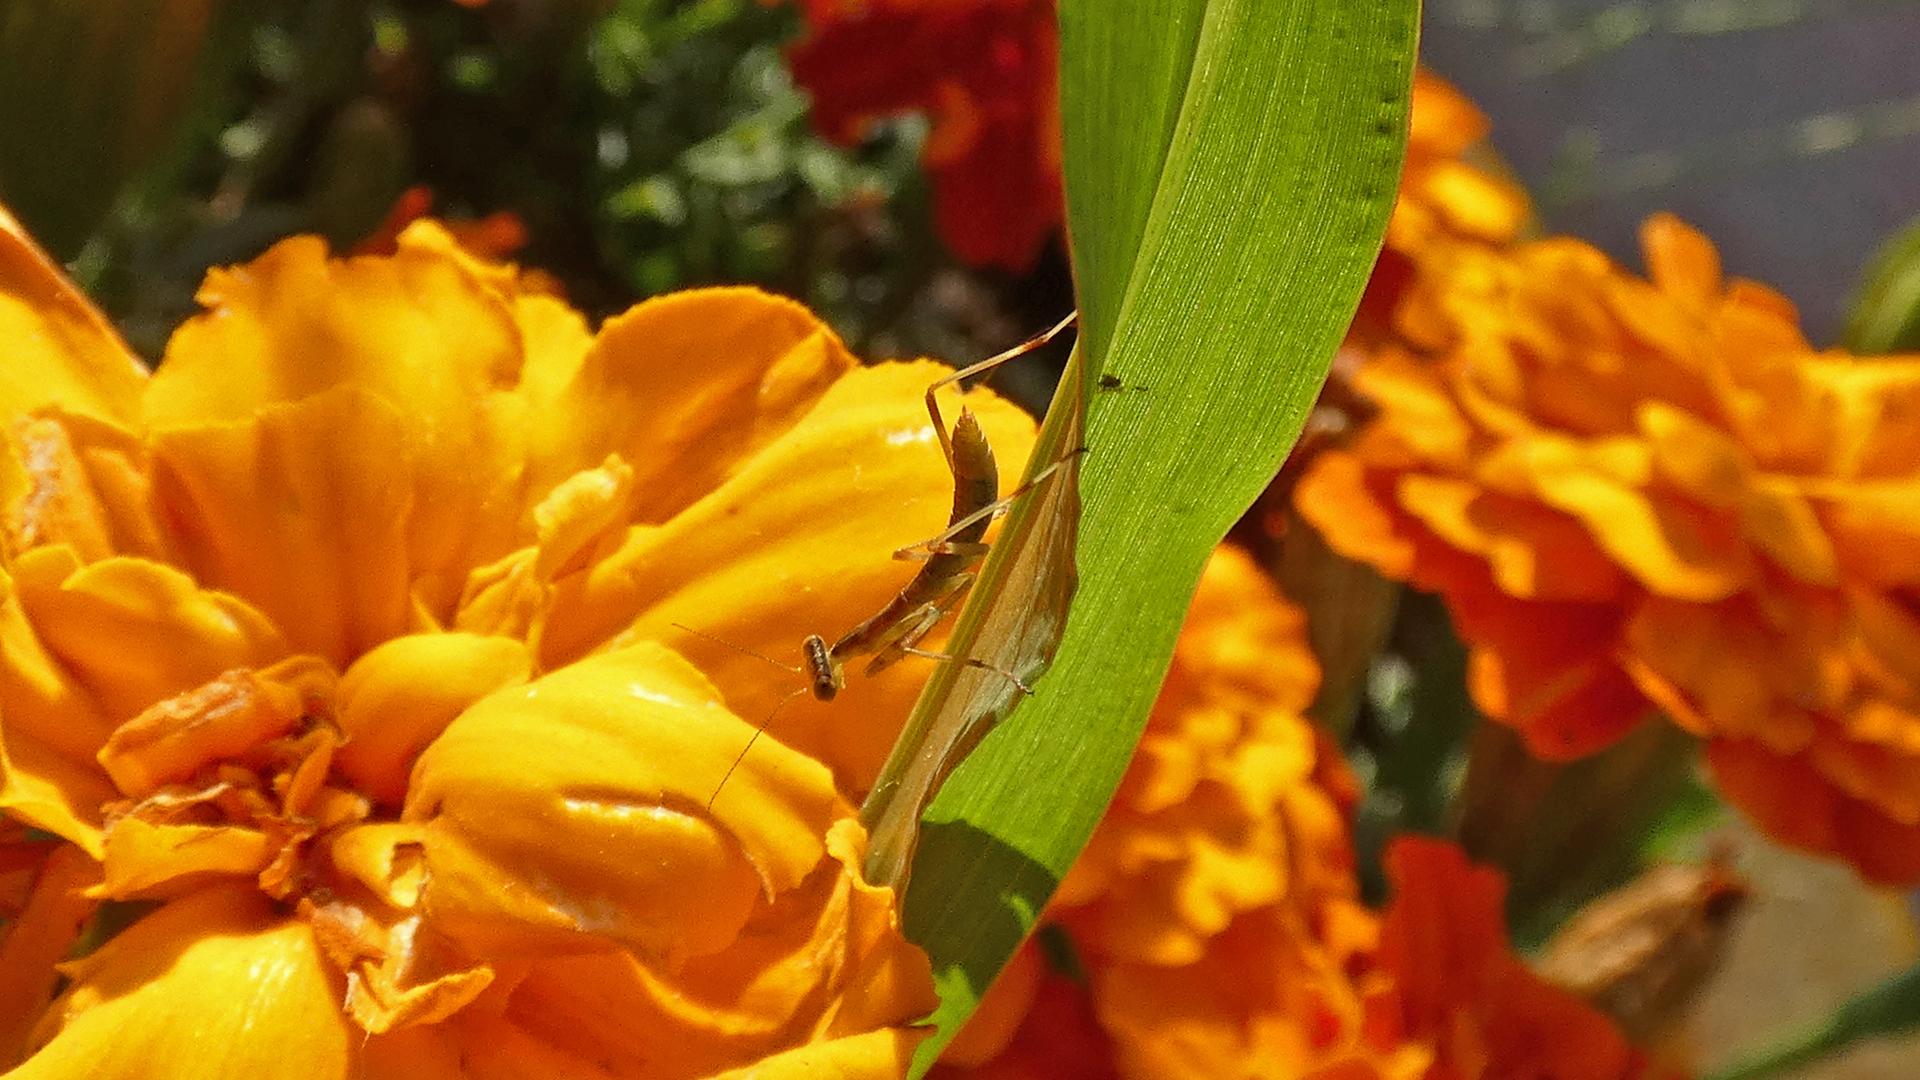 On bade of grass among marigolds, June 2021